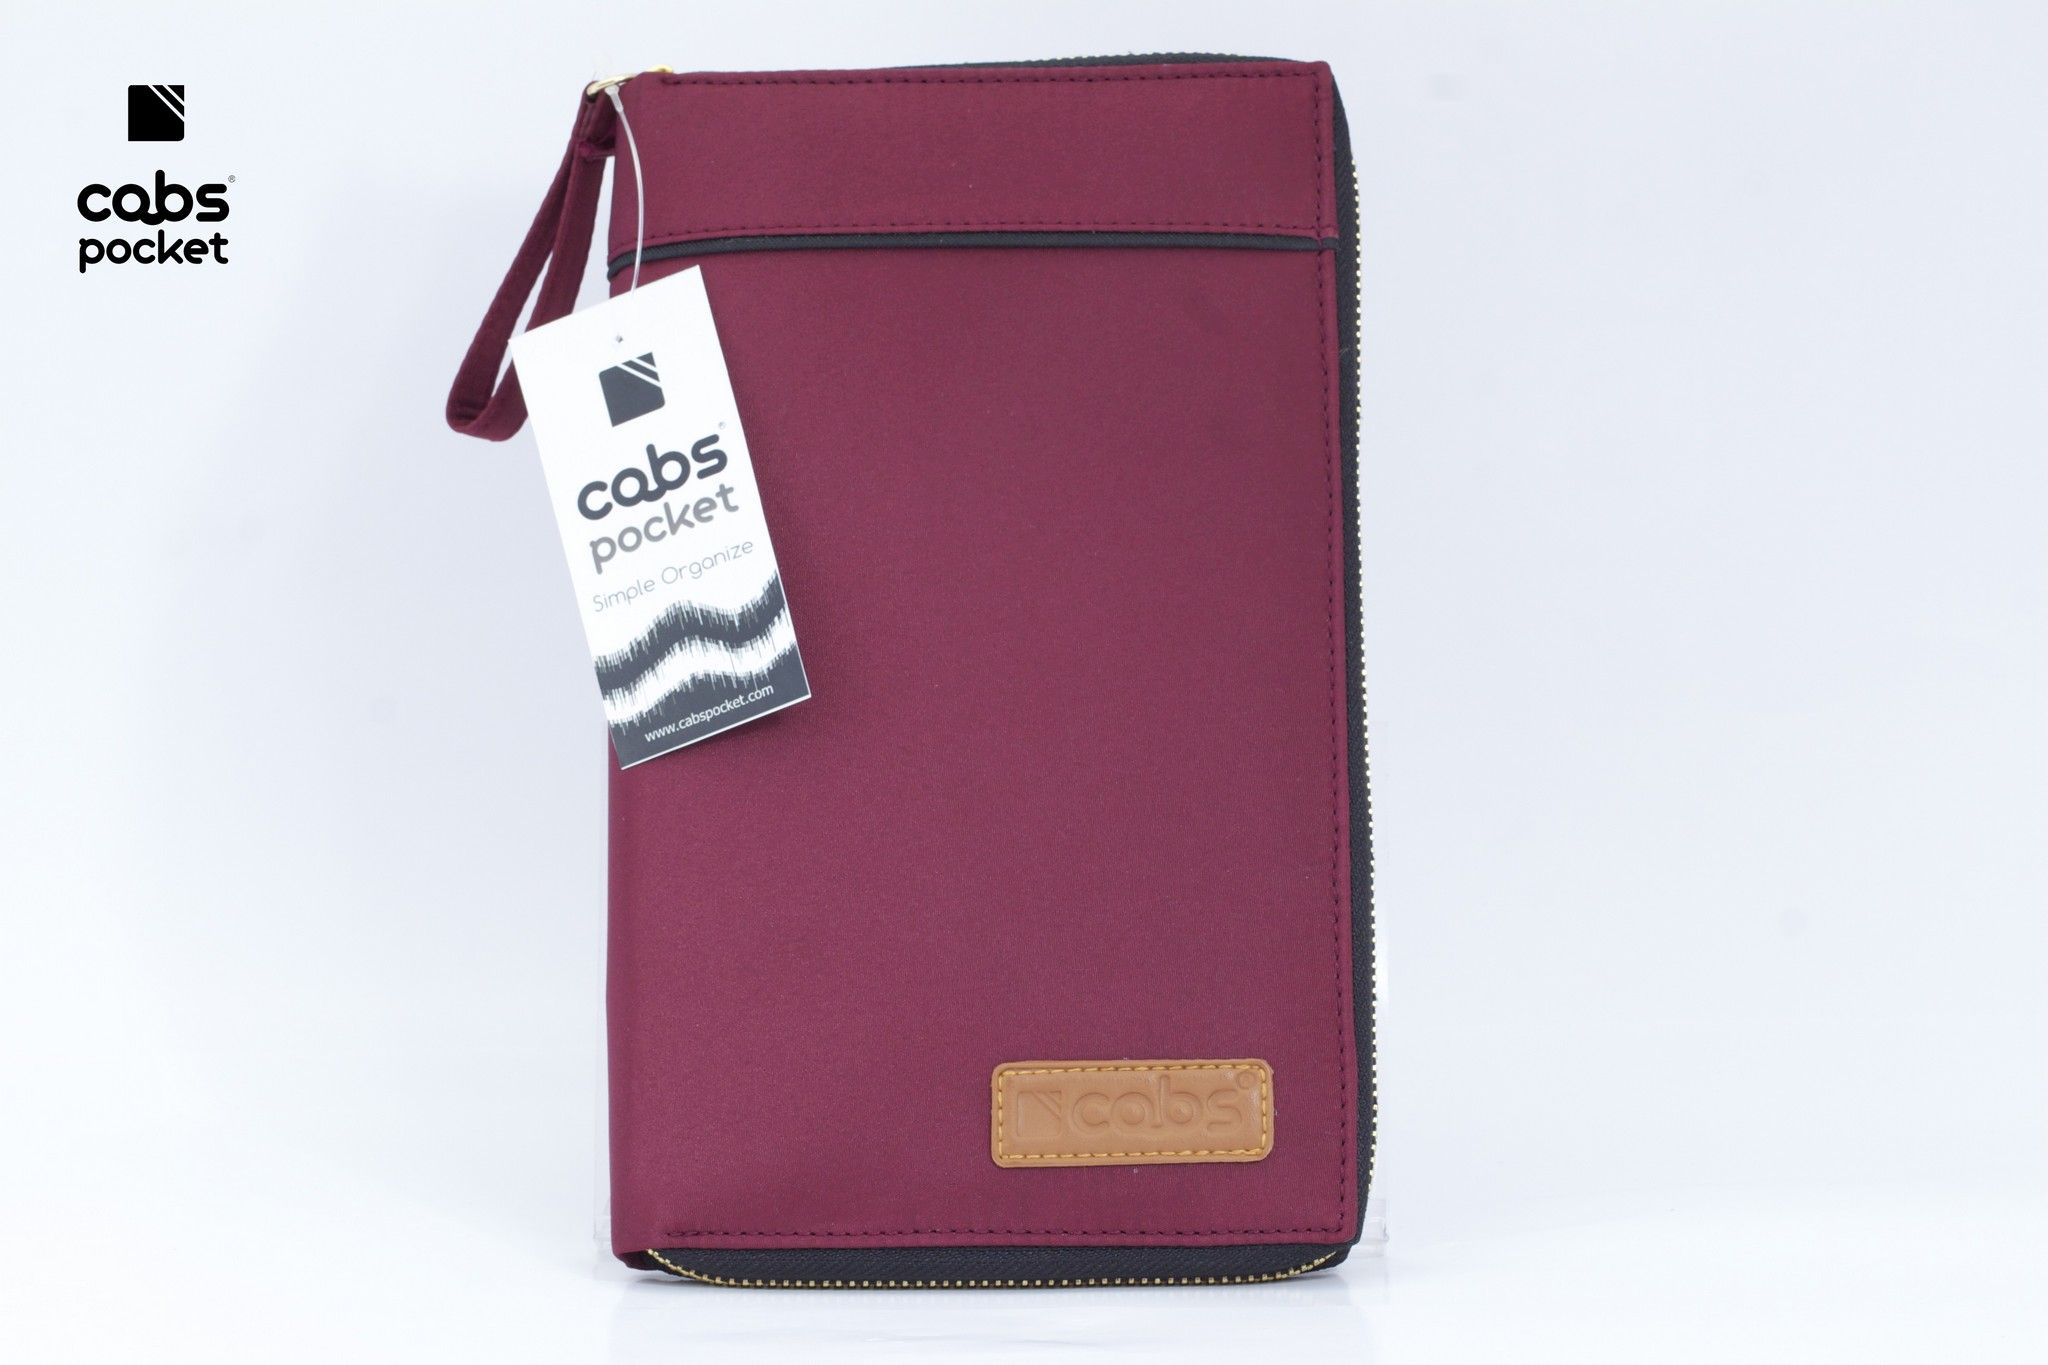 Cabs Pocket Slim (Dompet Serbaguna HPO Organizer untuk Pria & Wanita Dompet Kartu Lokal Wallet Branded) Maroon